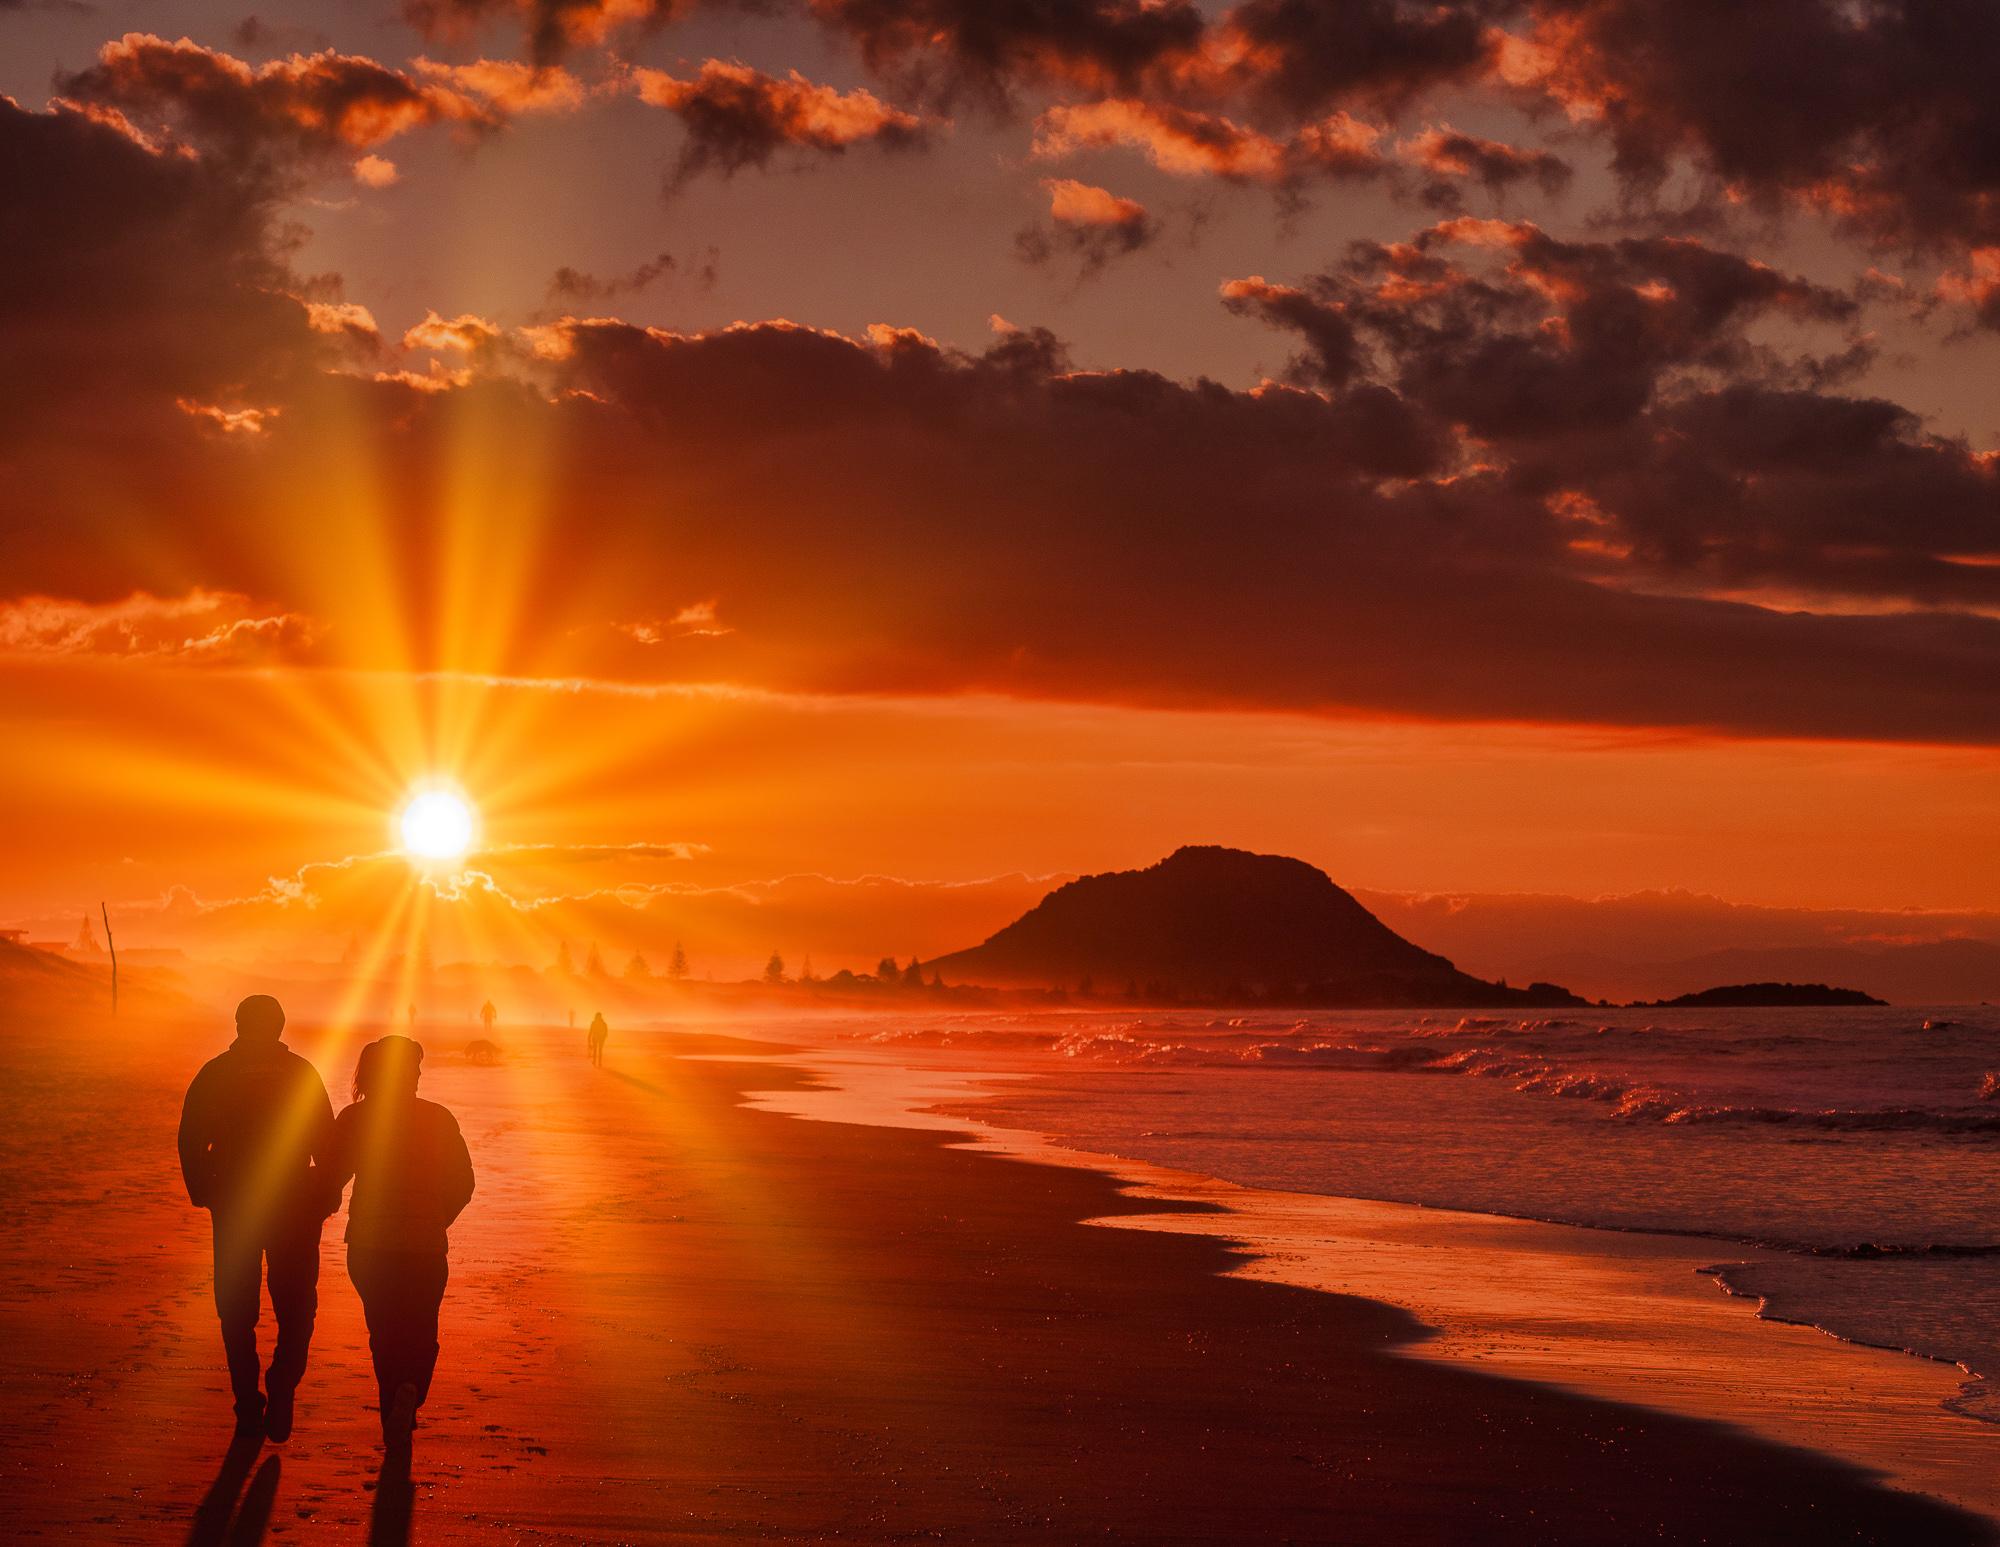 Evening walk. Papamoa Beach, Bay of Plenty. P6280022